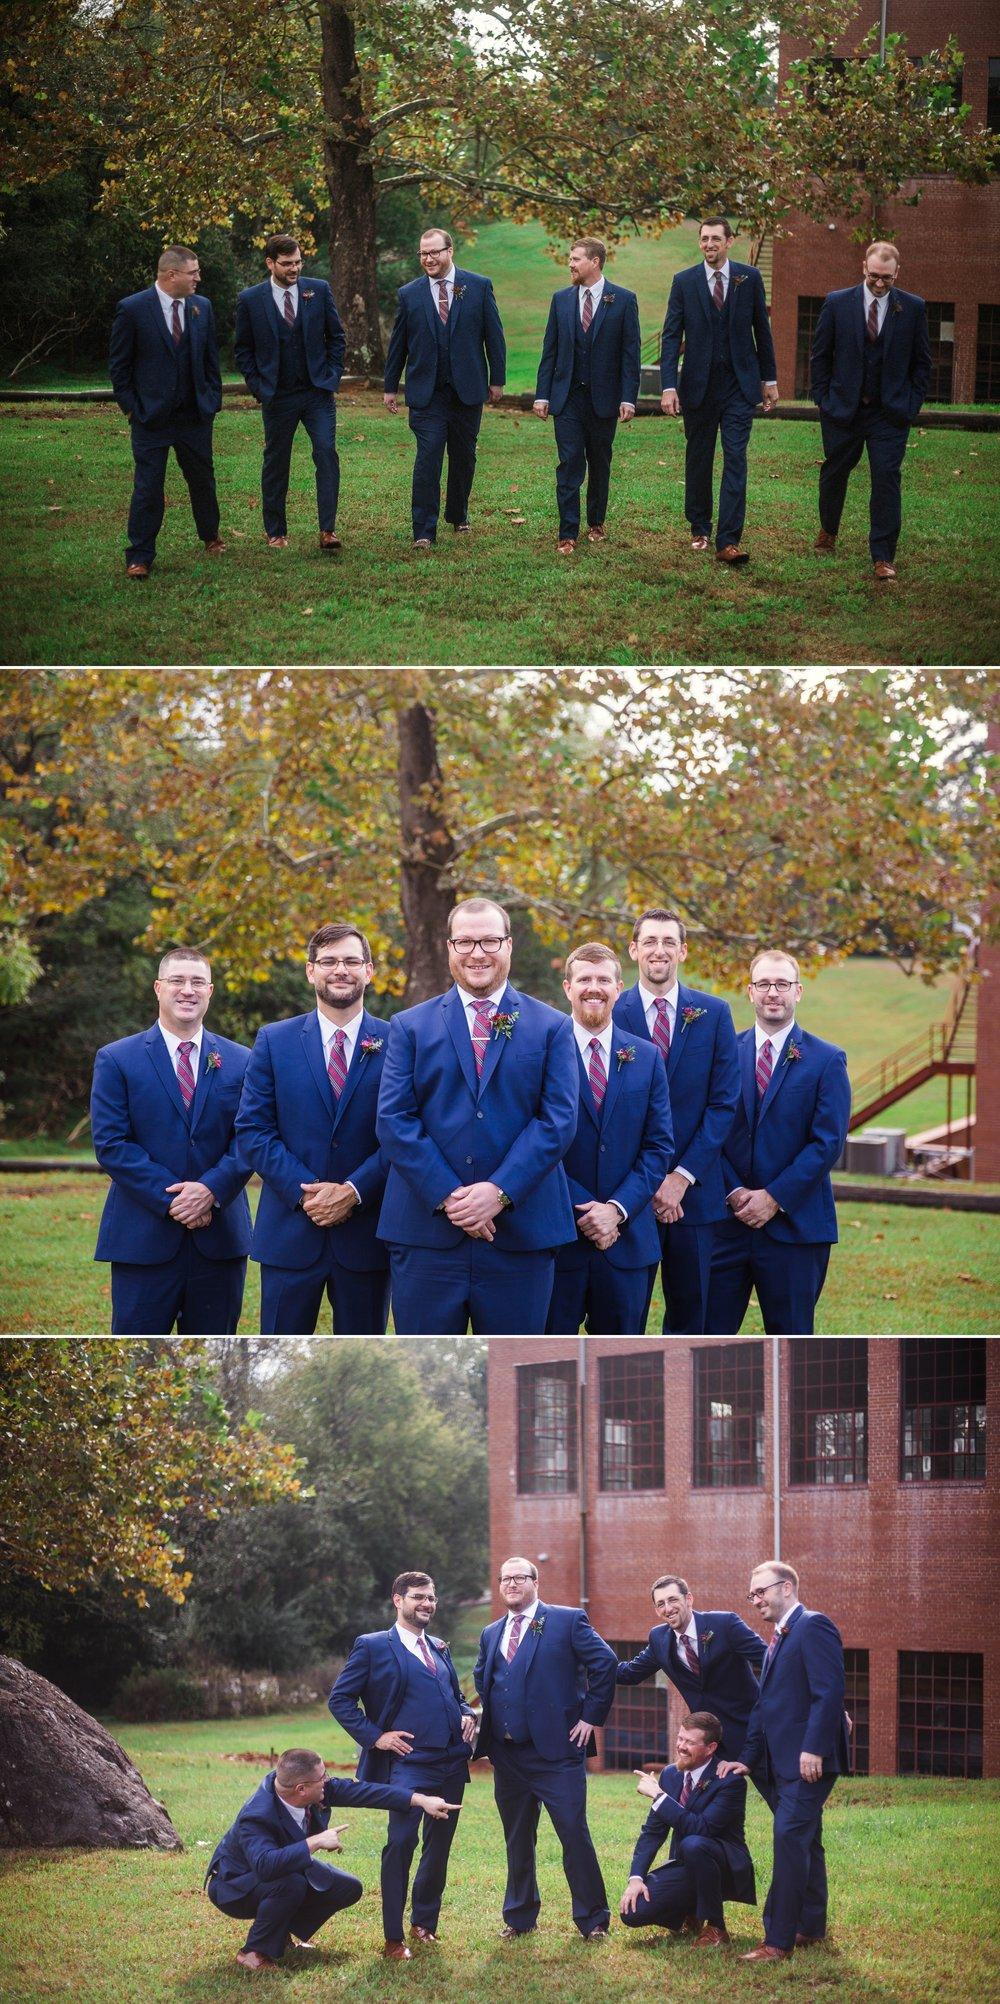 Groomsmen Portraits - Brittany + Douglas - Forest Hall at Chatham Mills in Pittsboro, NC - Raleigh North Carolina Wedding Photographer